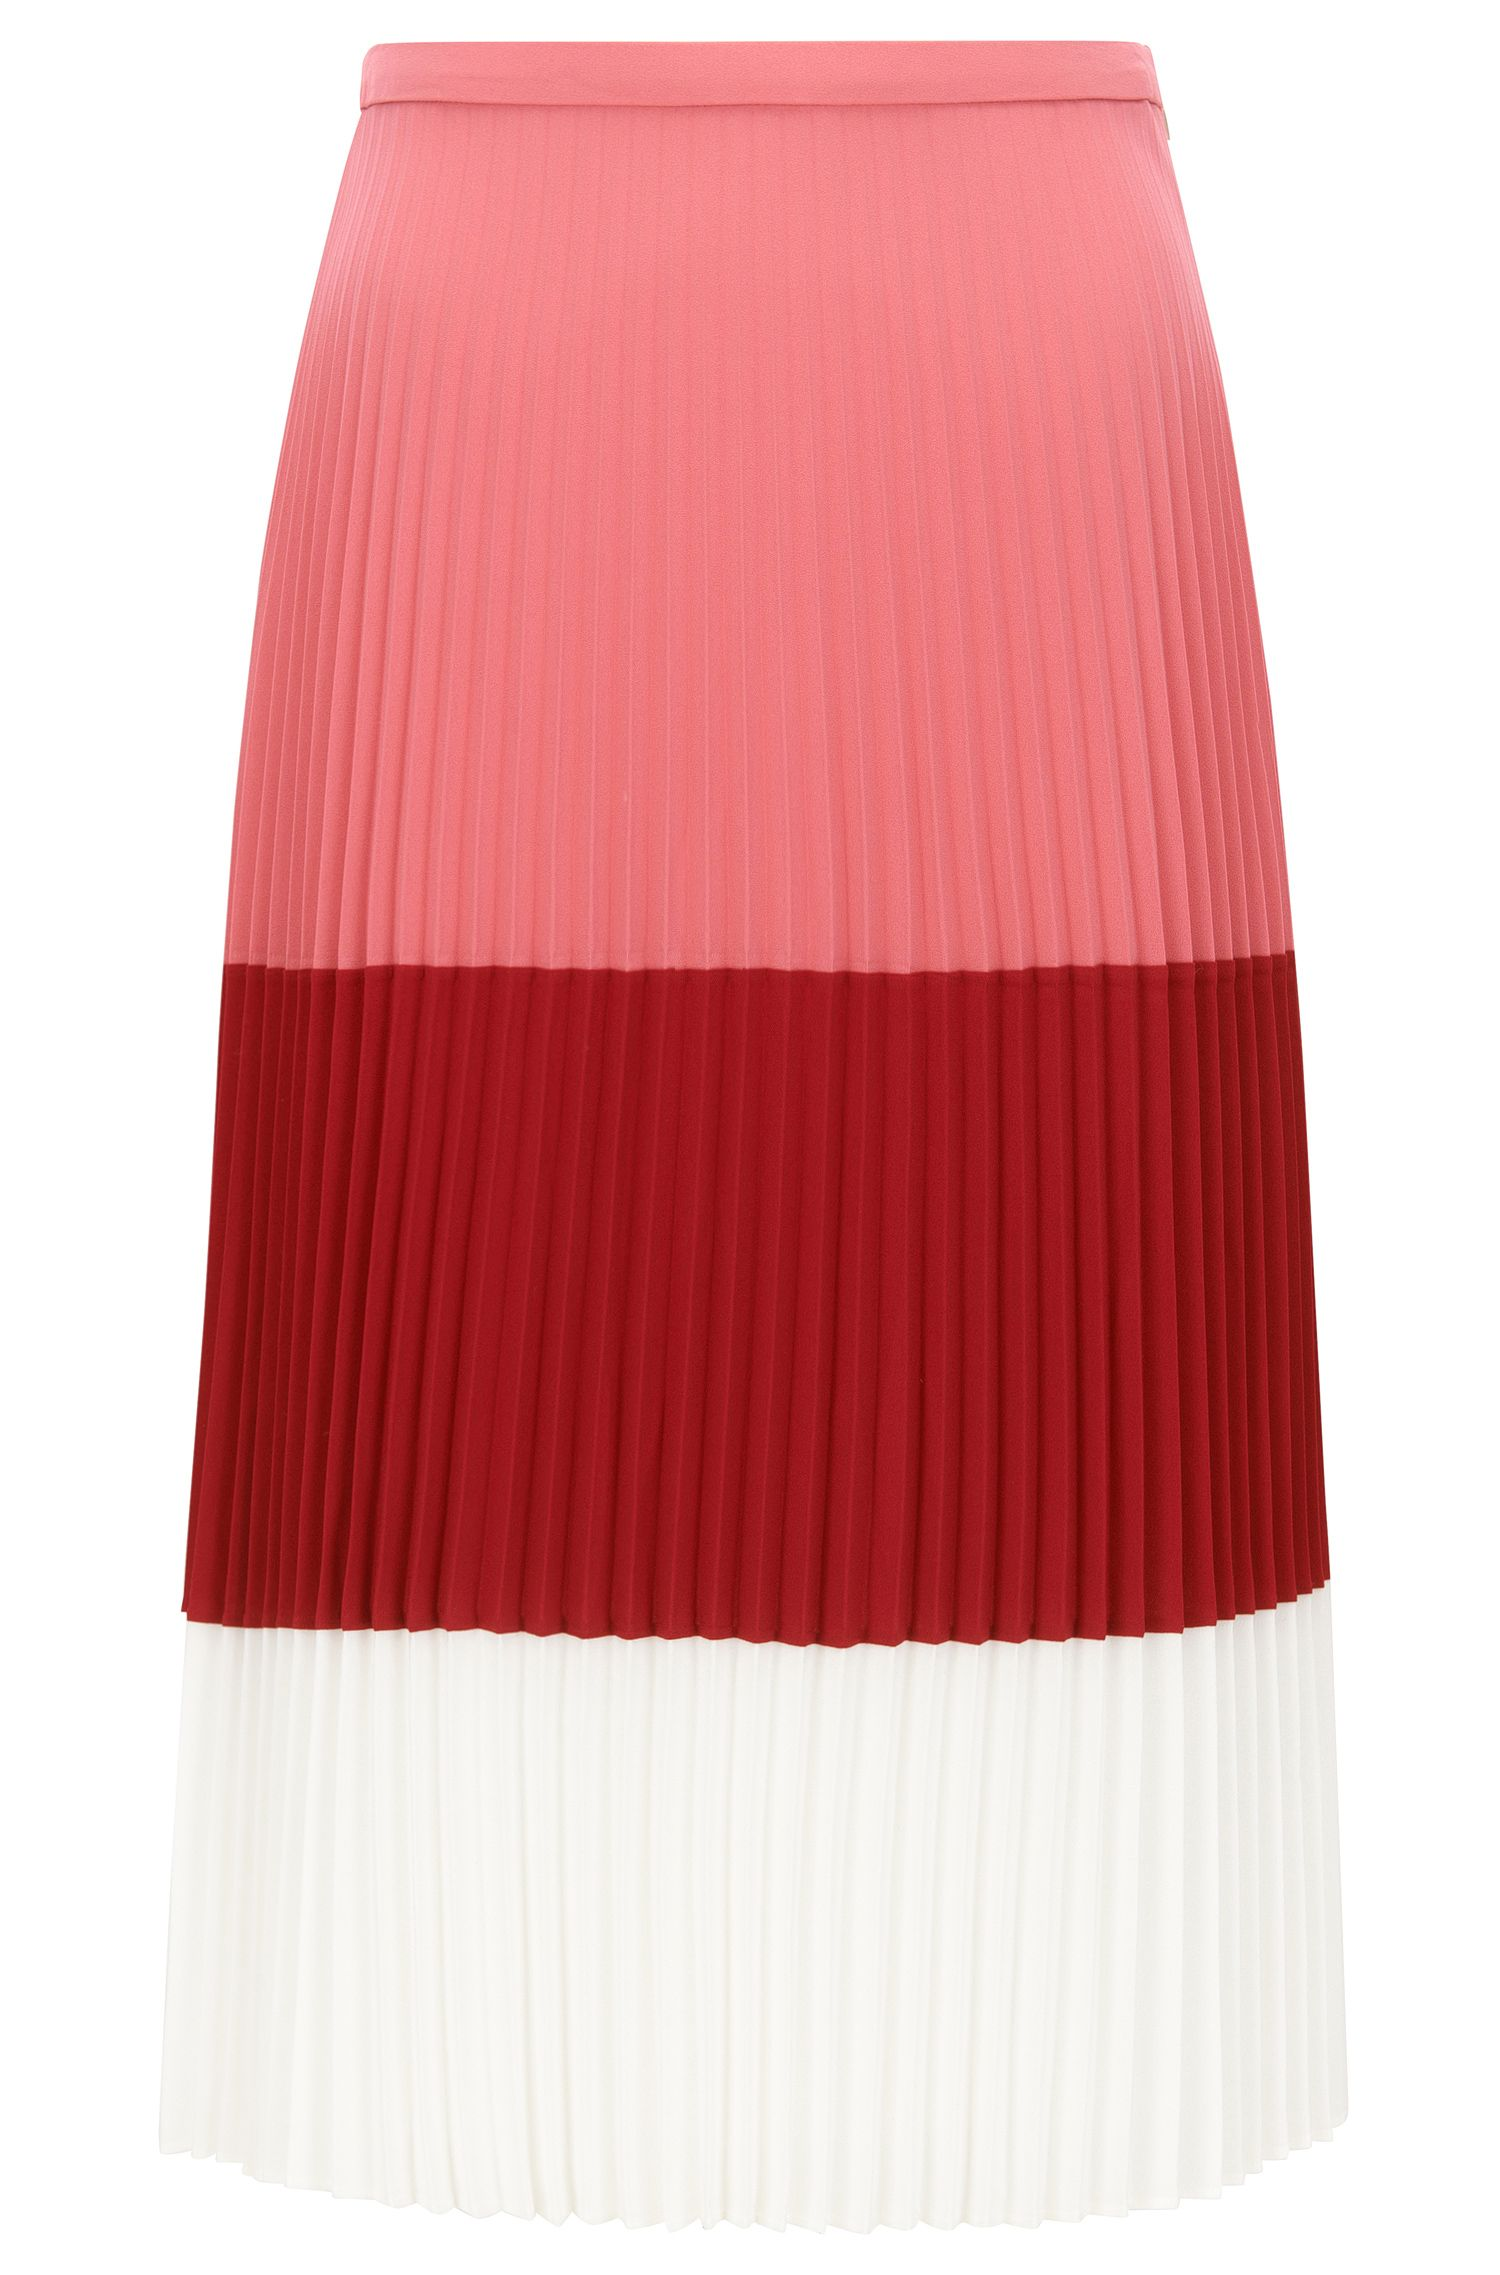 Falda plisada regular fit en tejido ligero